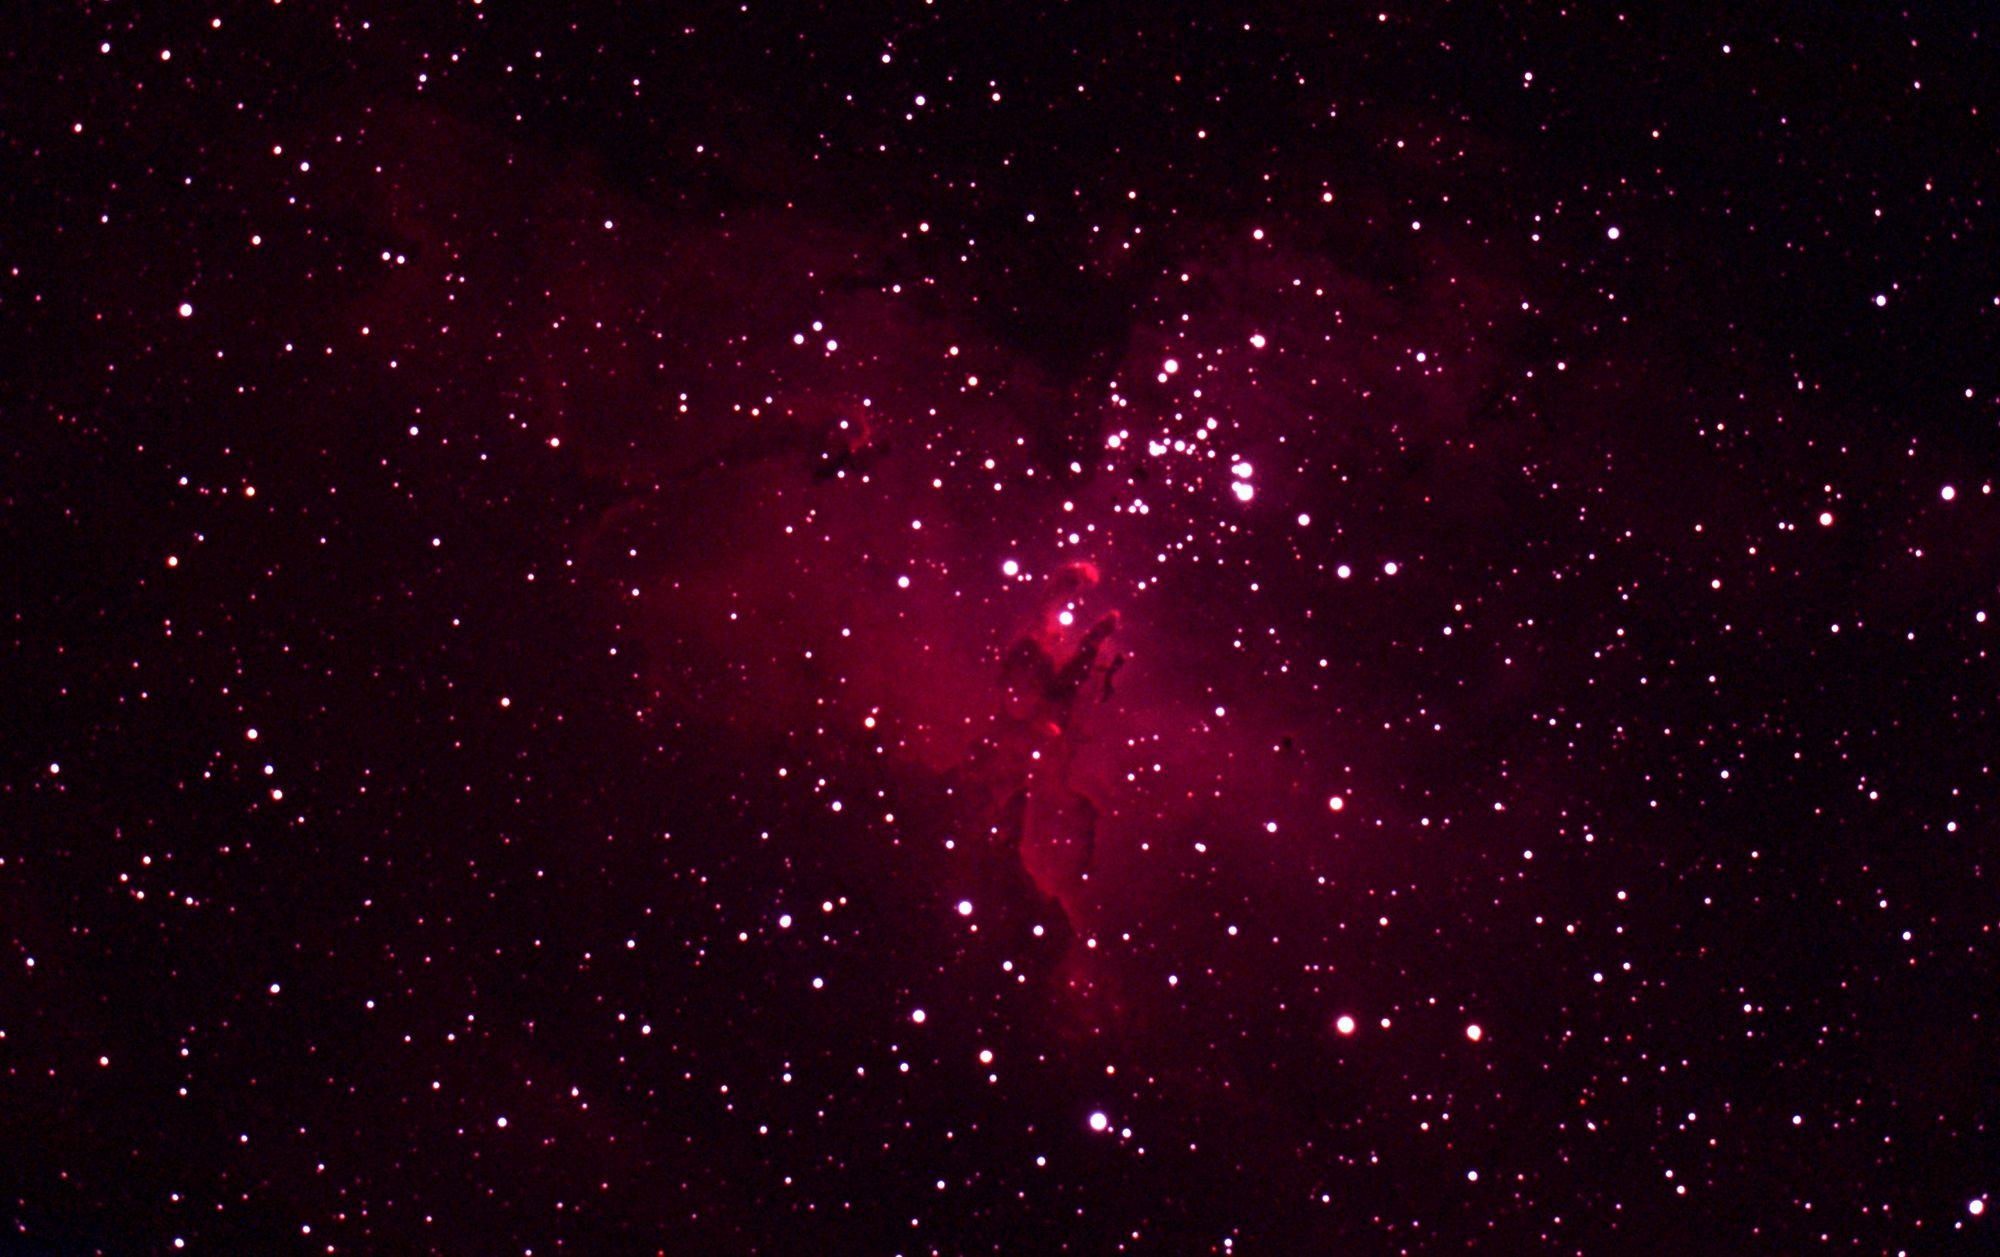 M16 - Eagle Nebula